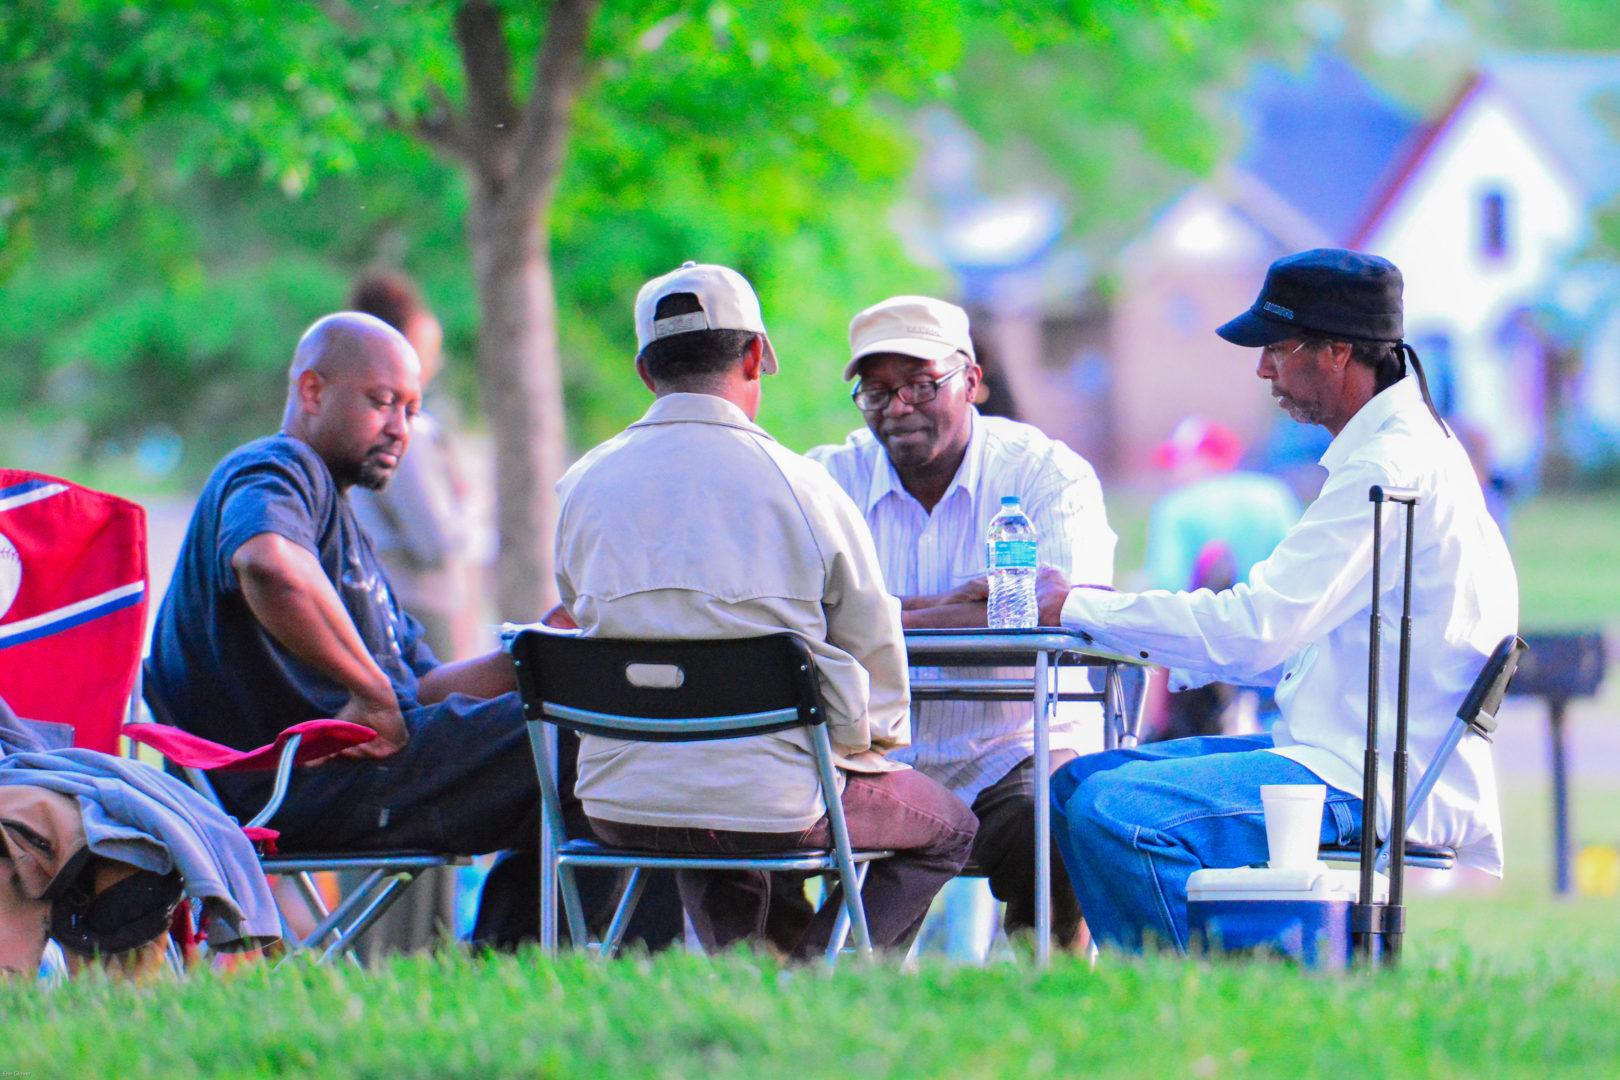 Men Playing A Game - Erin Glover